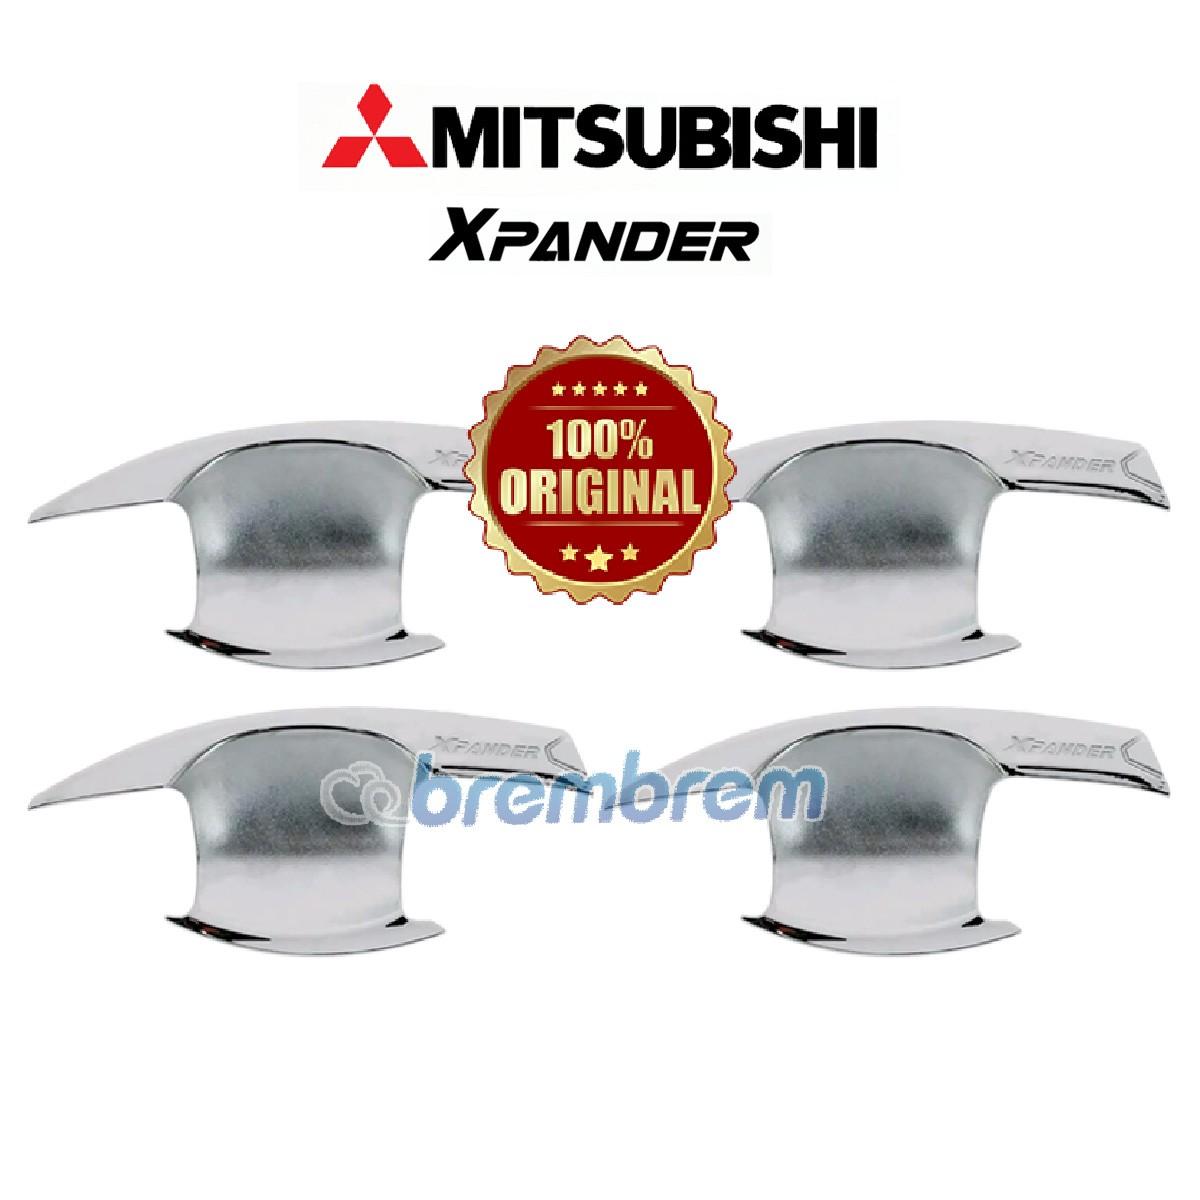 OUTER HANDLE CHROME MITSUBISHI XPANDER